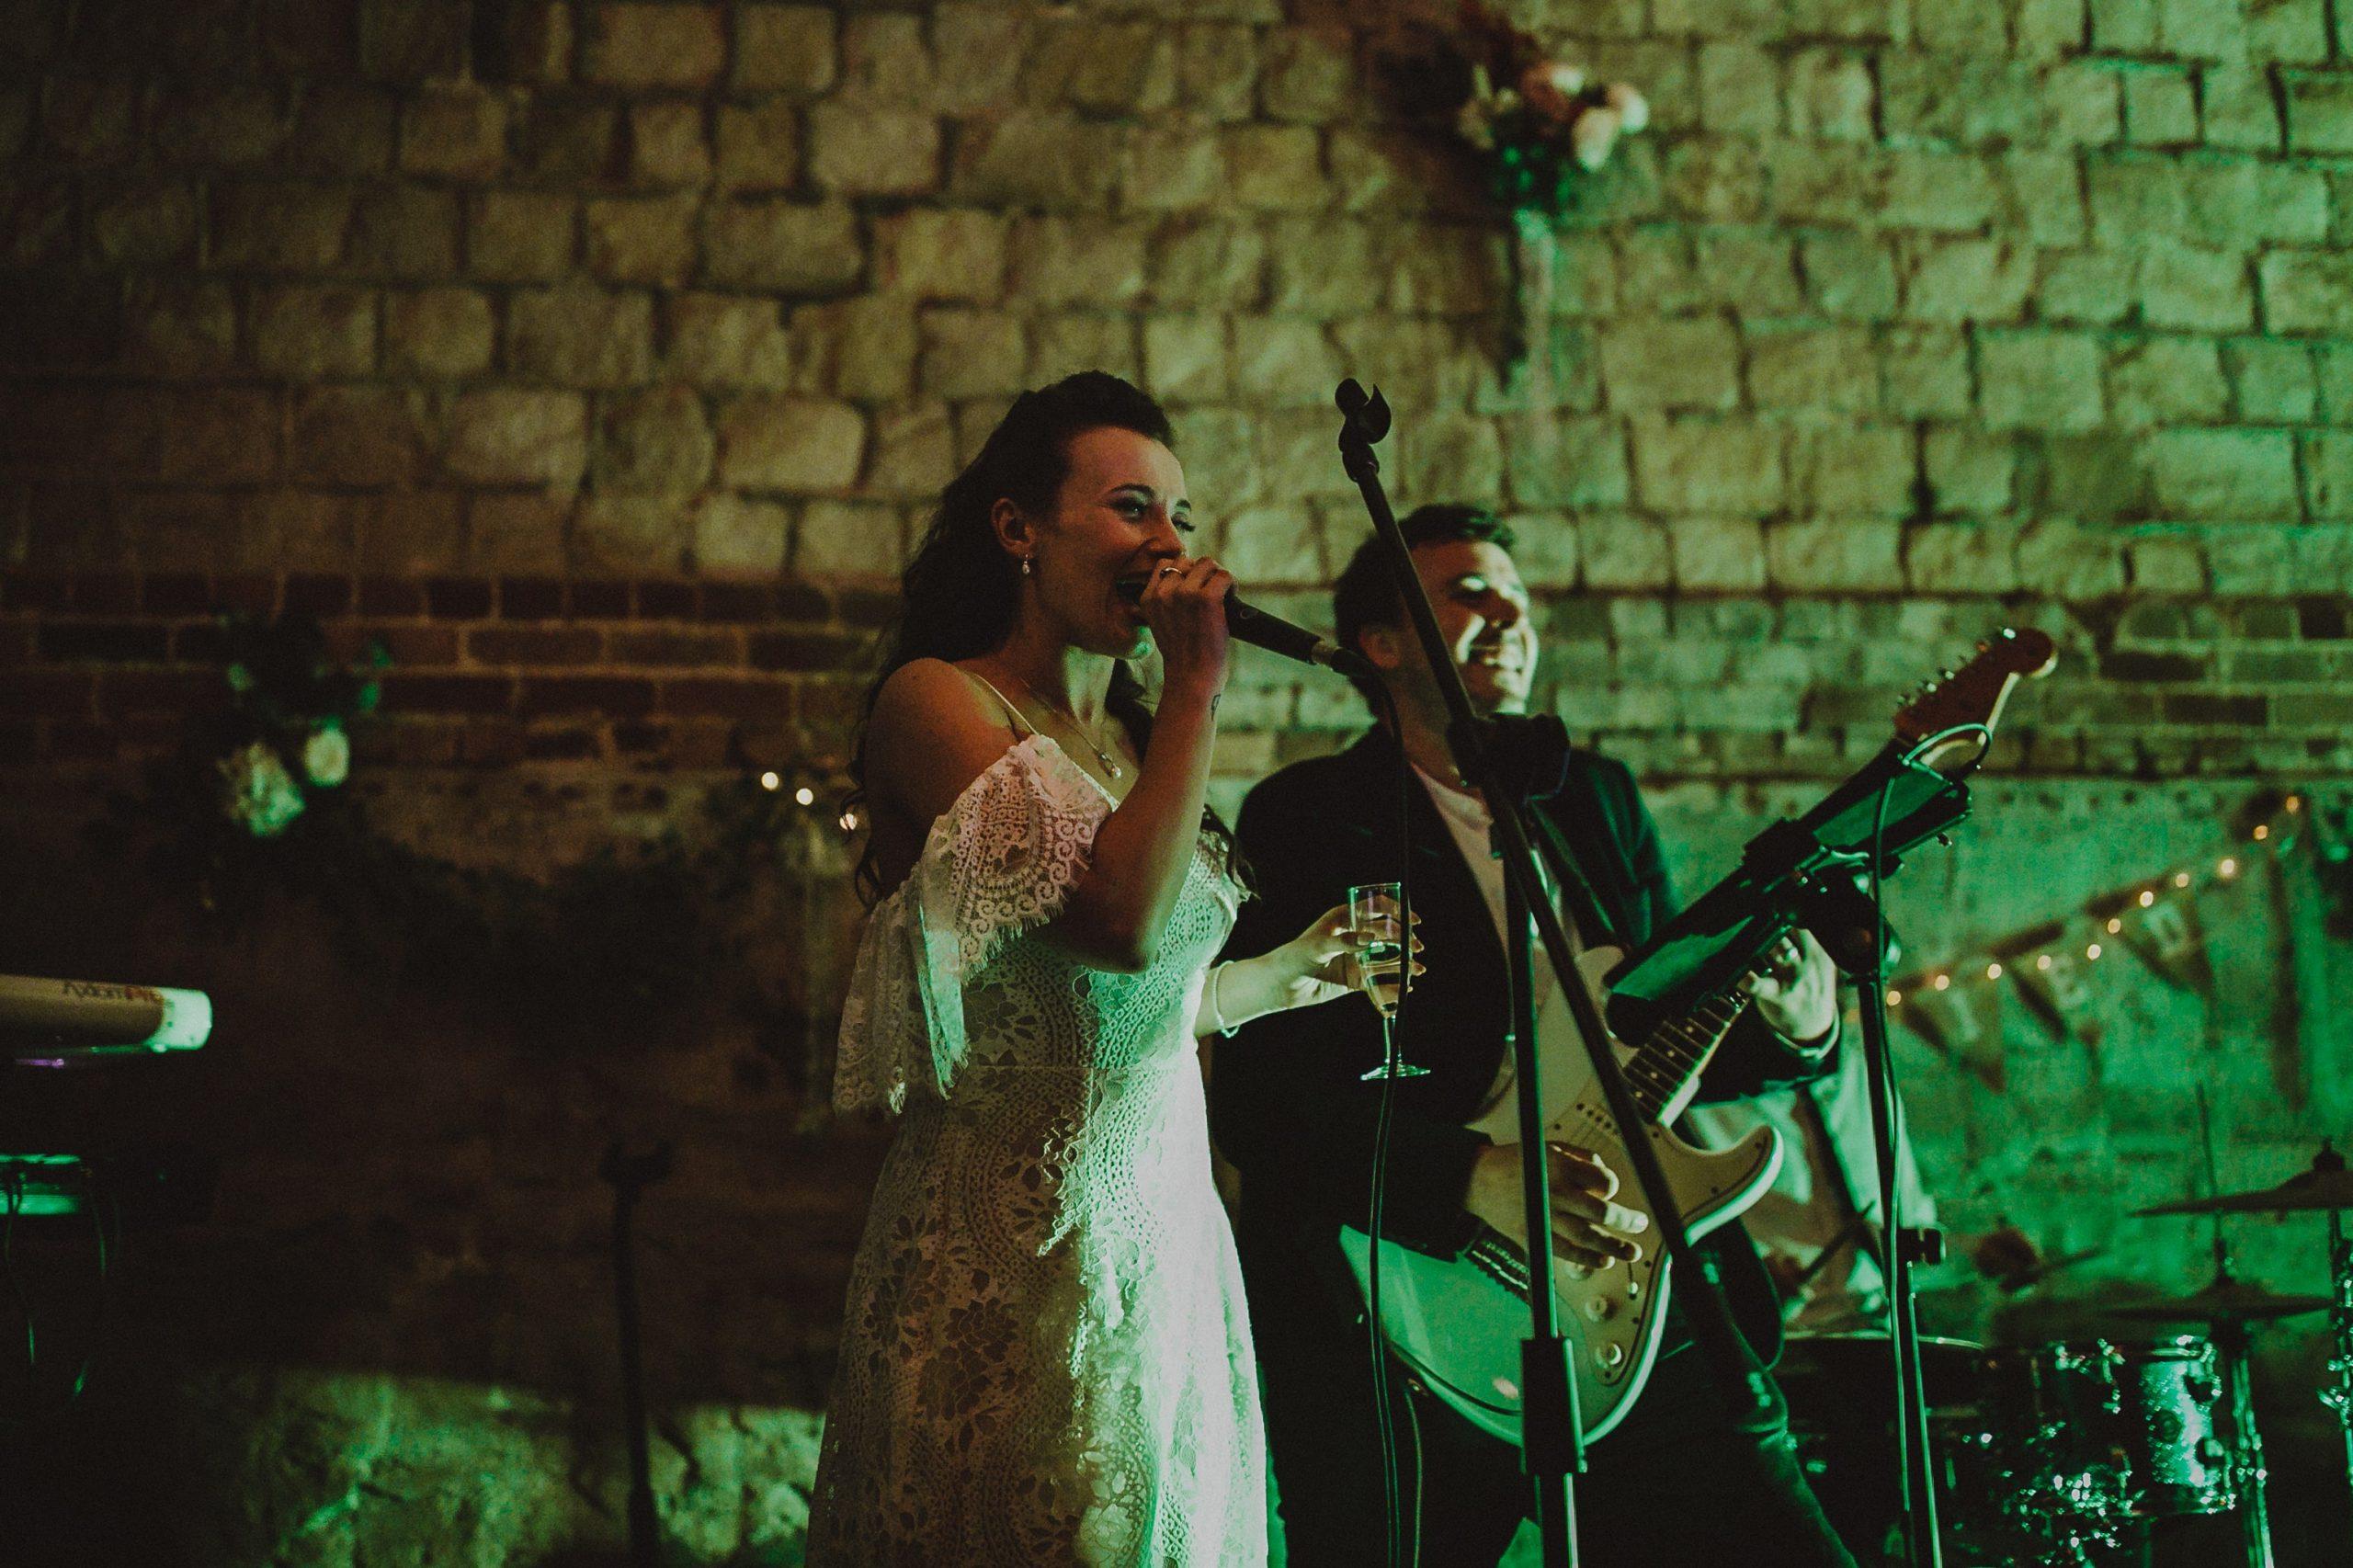 Tasha Sings with Roxy Jukebox